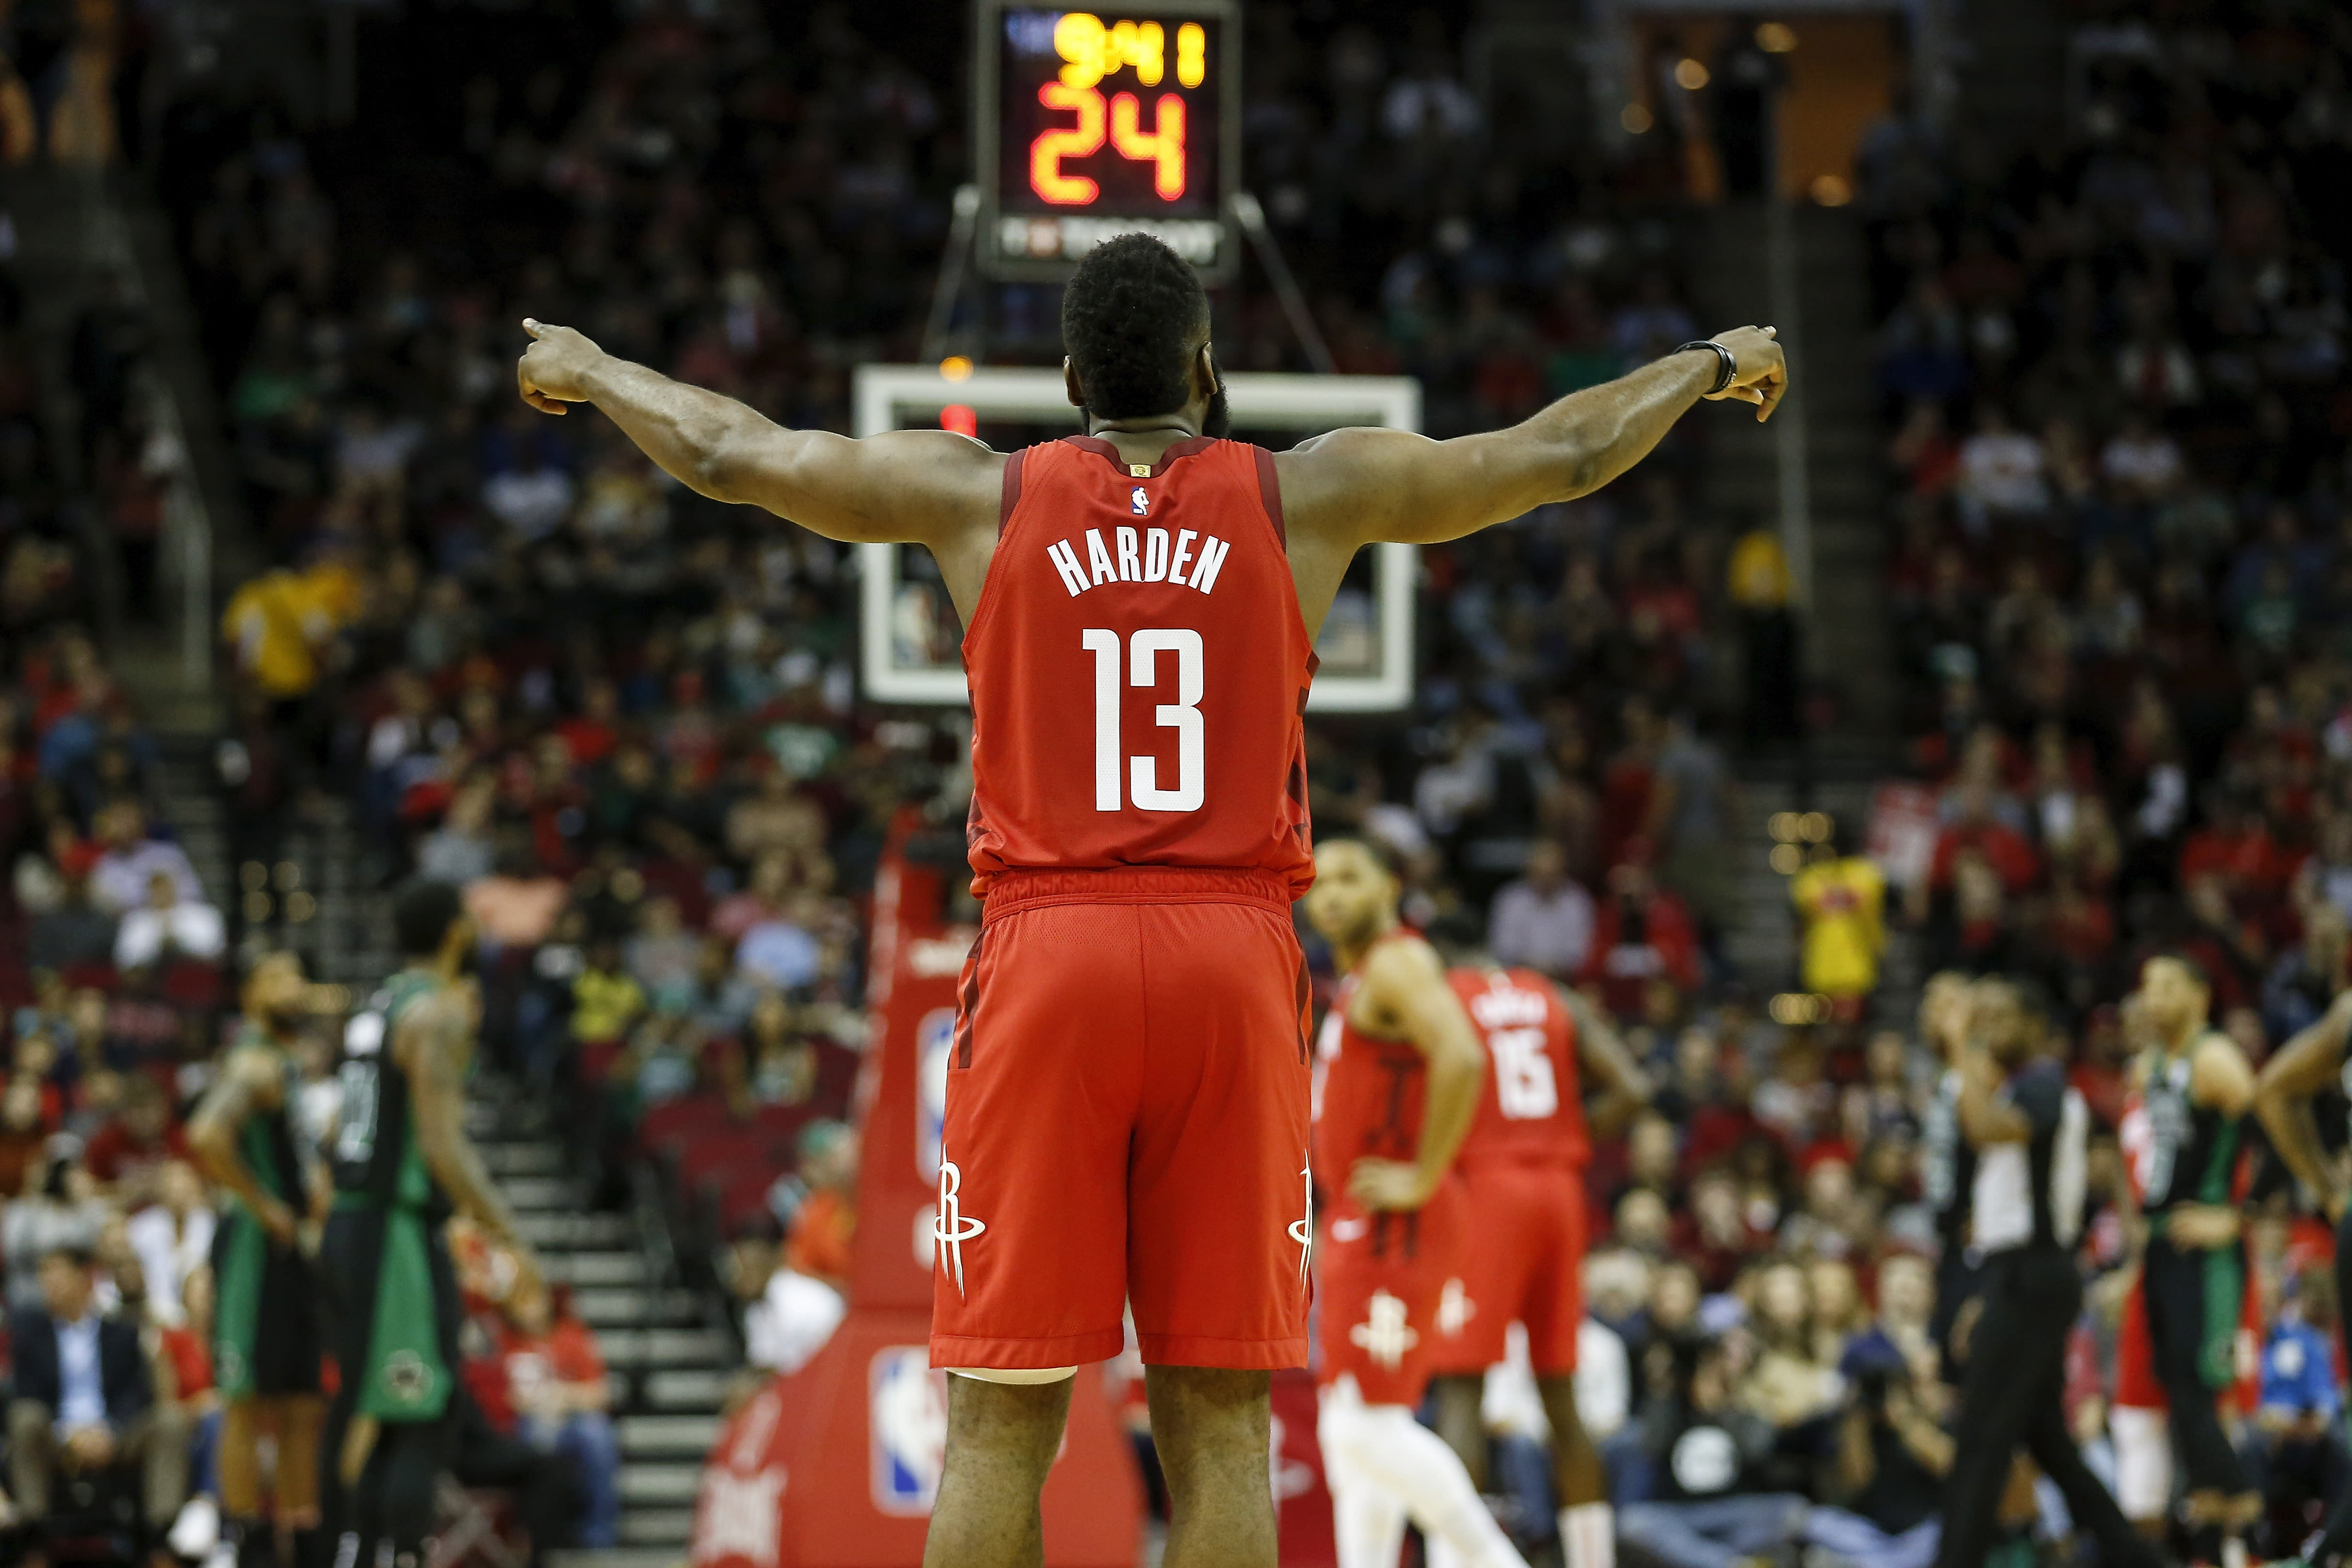 【NBA】你覺得哈登目前的表現有機會連莊MVP嗎?